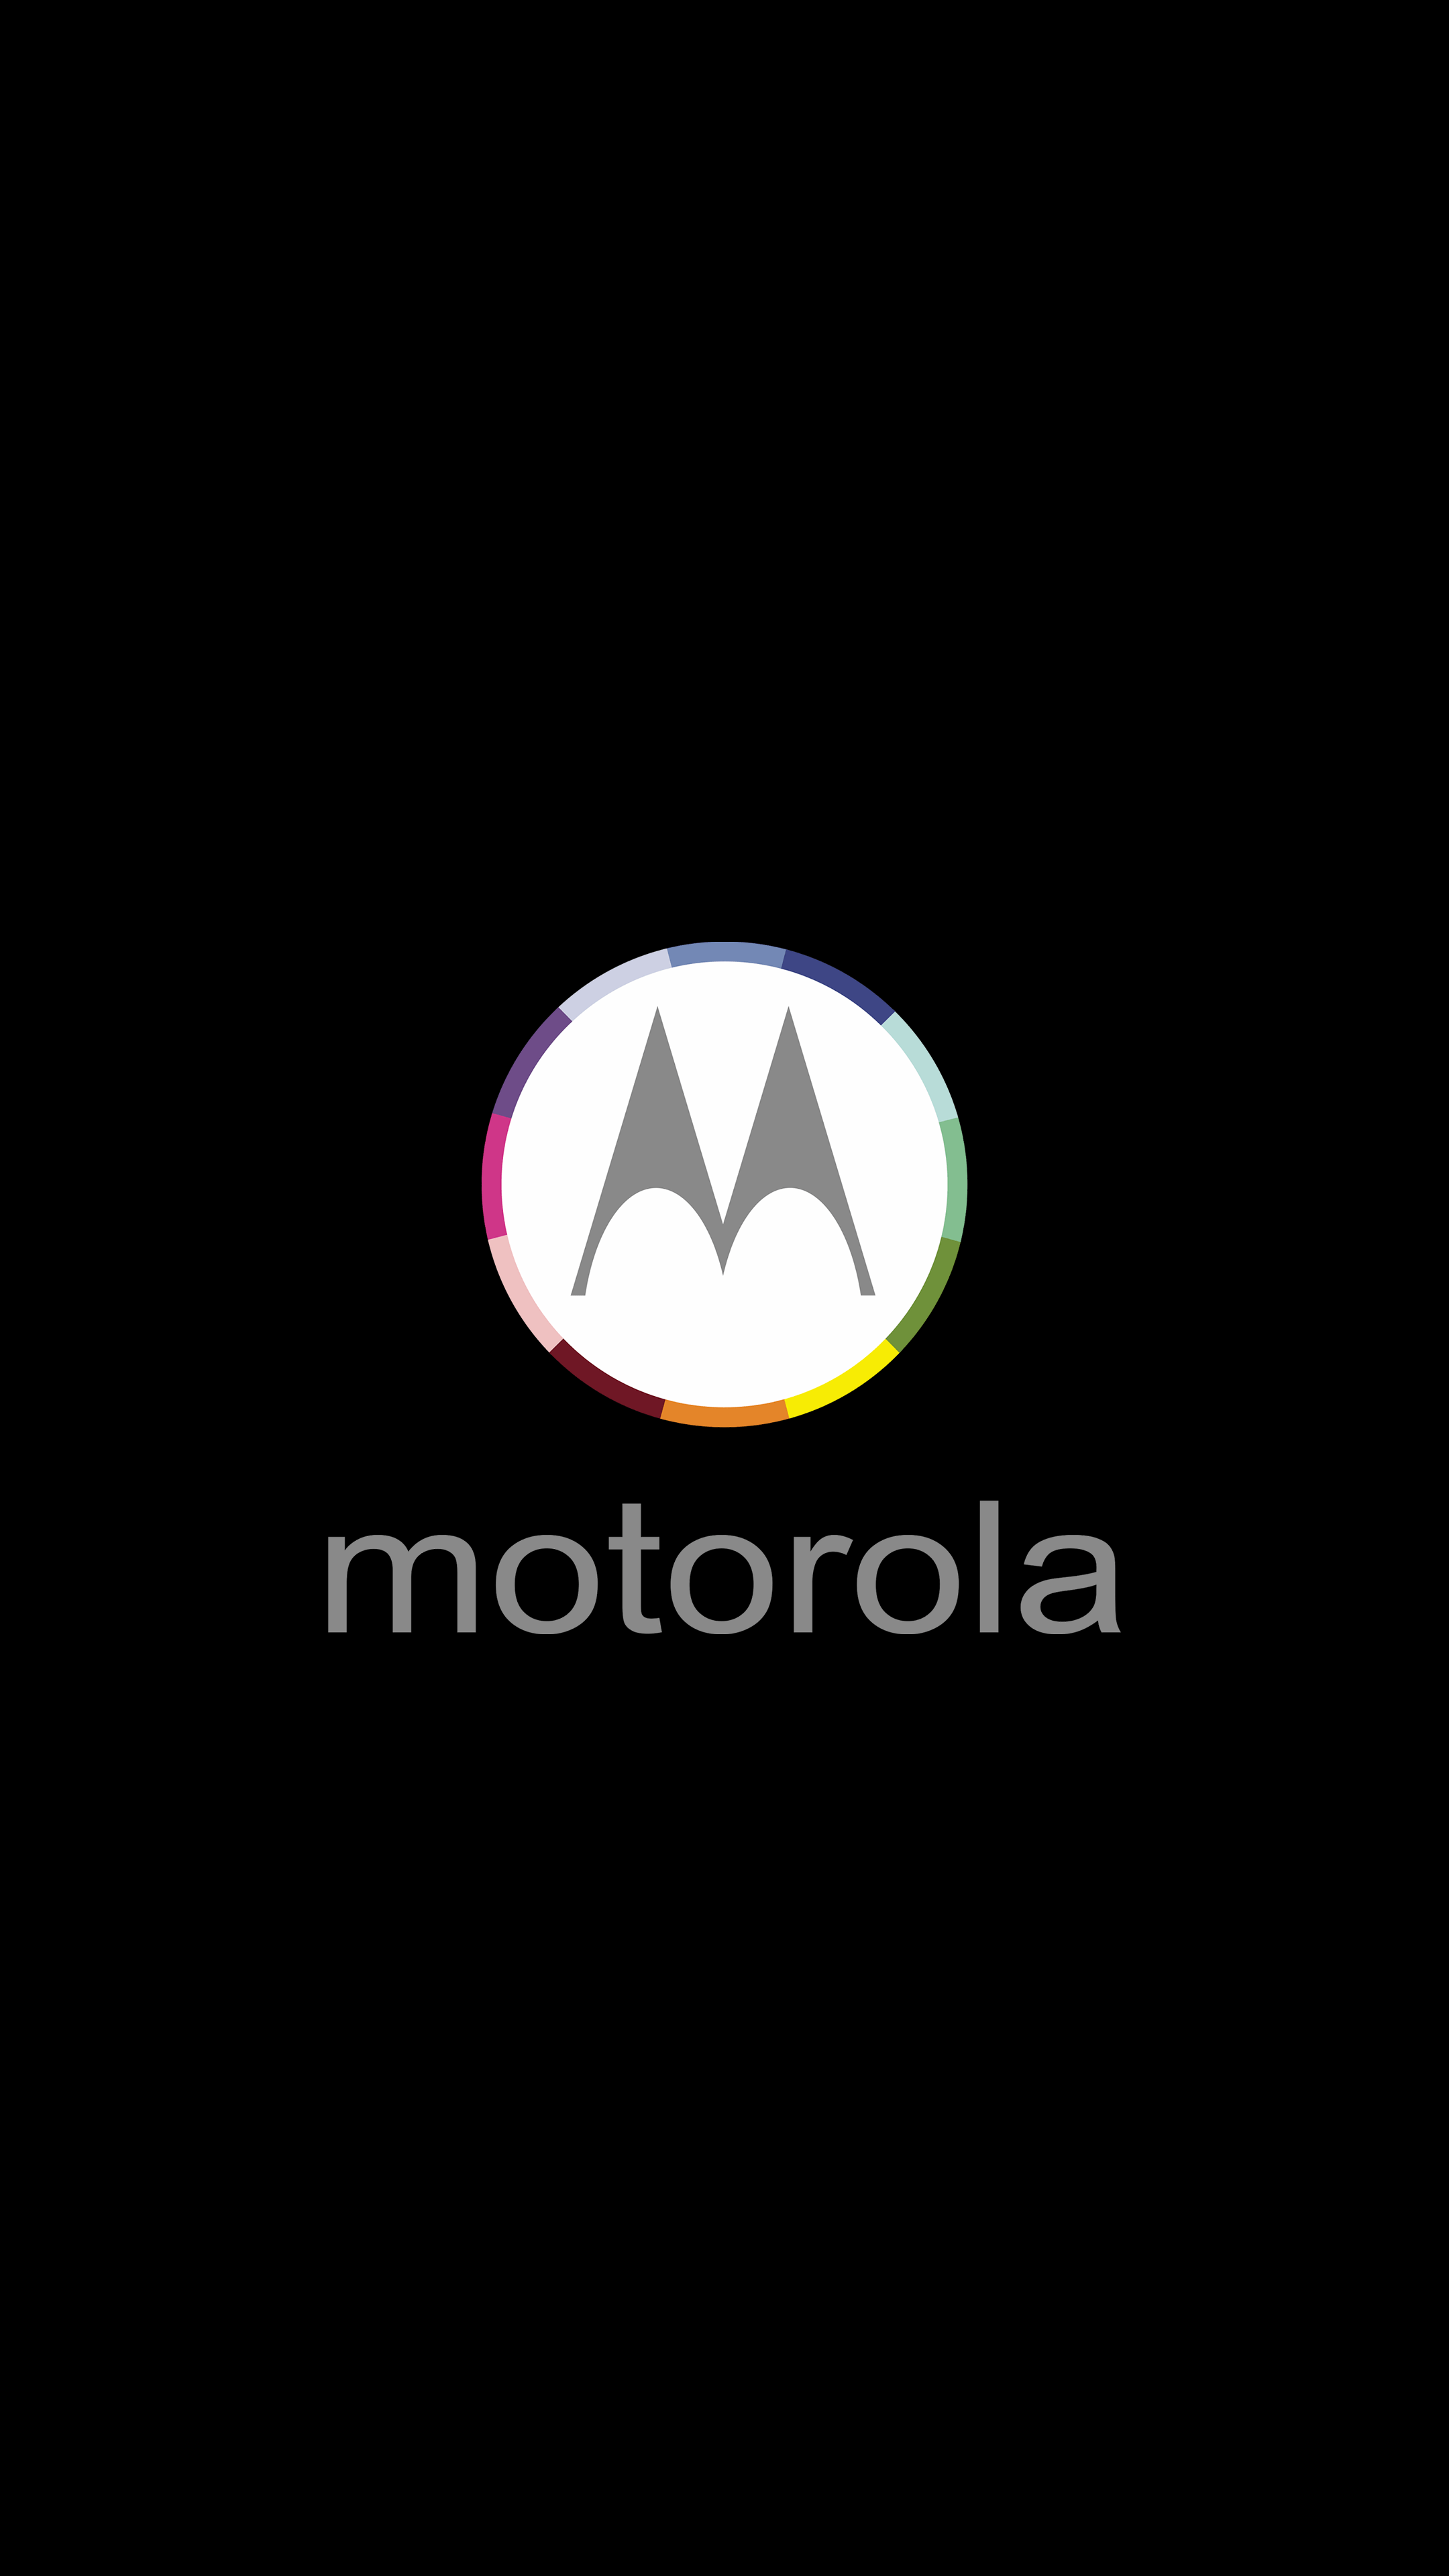 Motorola 4K AMOLED Wallpaper – Amoled Wallpapers